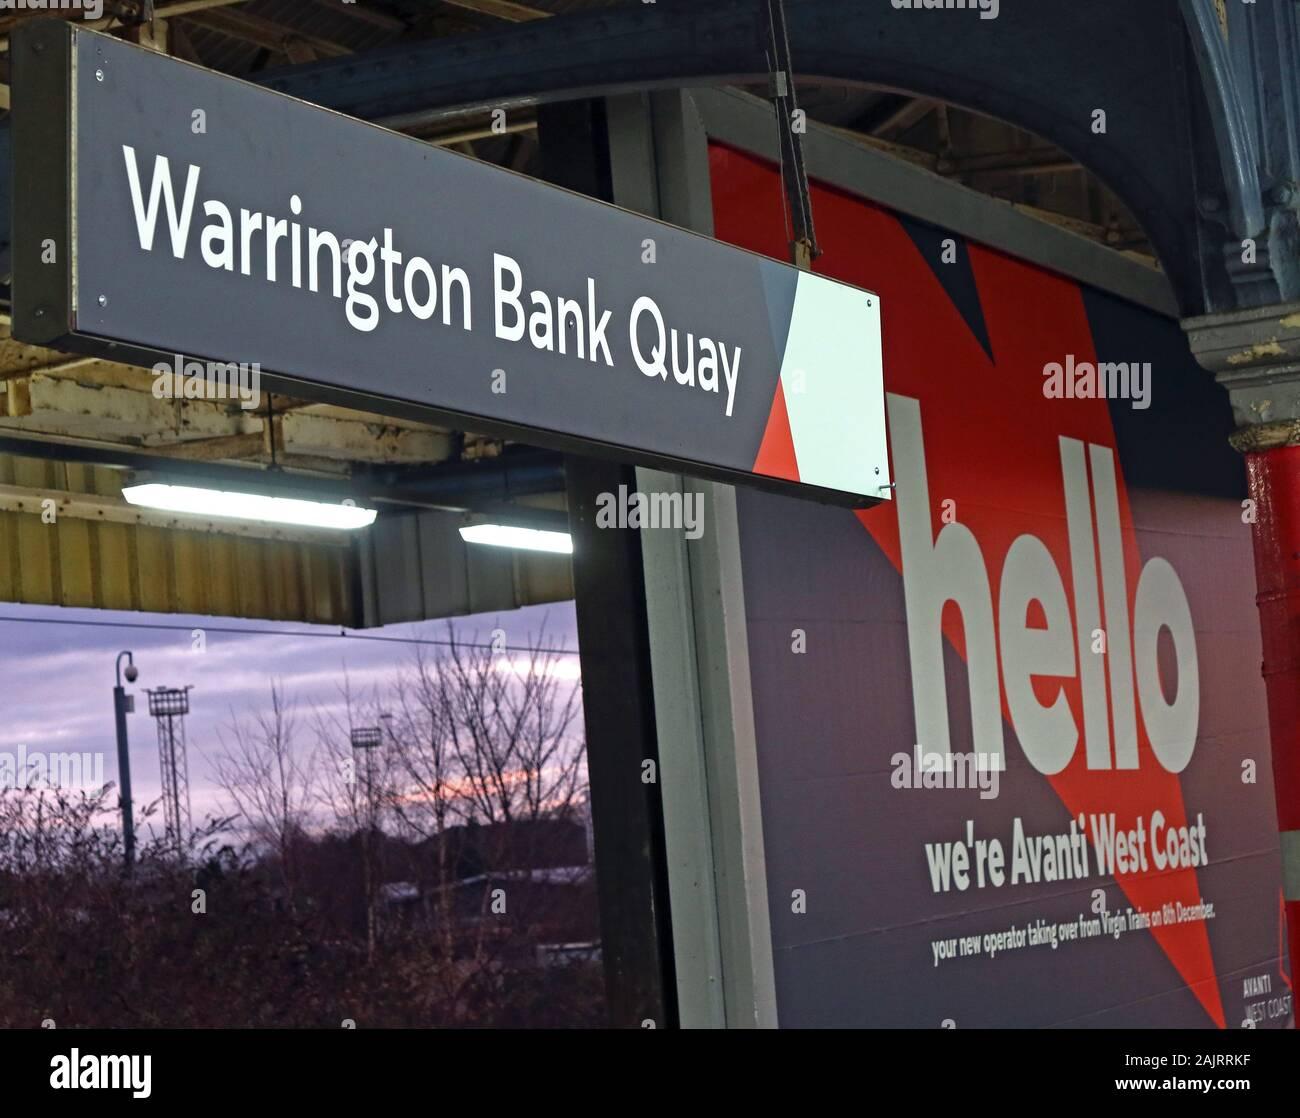 GoTonySmith,HotpixUK,@HotpixUK,Dec 2019,Virgin Trains,franchise,TOC,train operating company,delays,complaints,WBQ,train,rail,railway,UK,England,British Rail,British,Avanti West Coast,re-brand,rebranded,new brand,Avanti FirstGroup TrenItalia,Warrington,Cheshire,advert,advertisement,publicity,evening,WCP,platform,station,WA1,Warrington Bank Quay Sign,Bank Quay Sign,platform two,Trains South,London Train